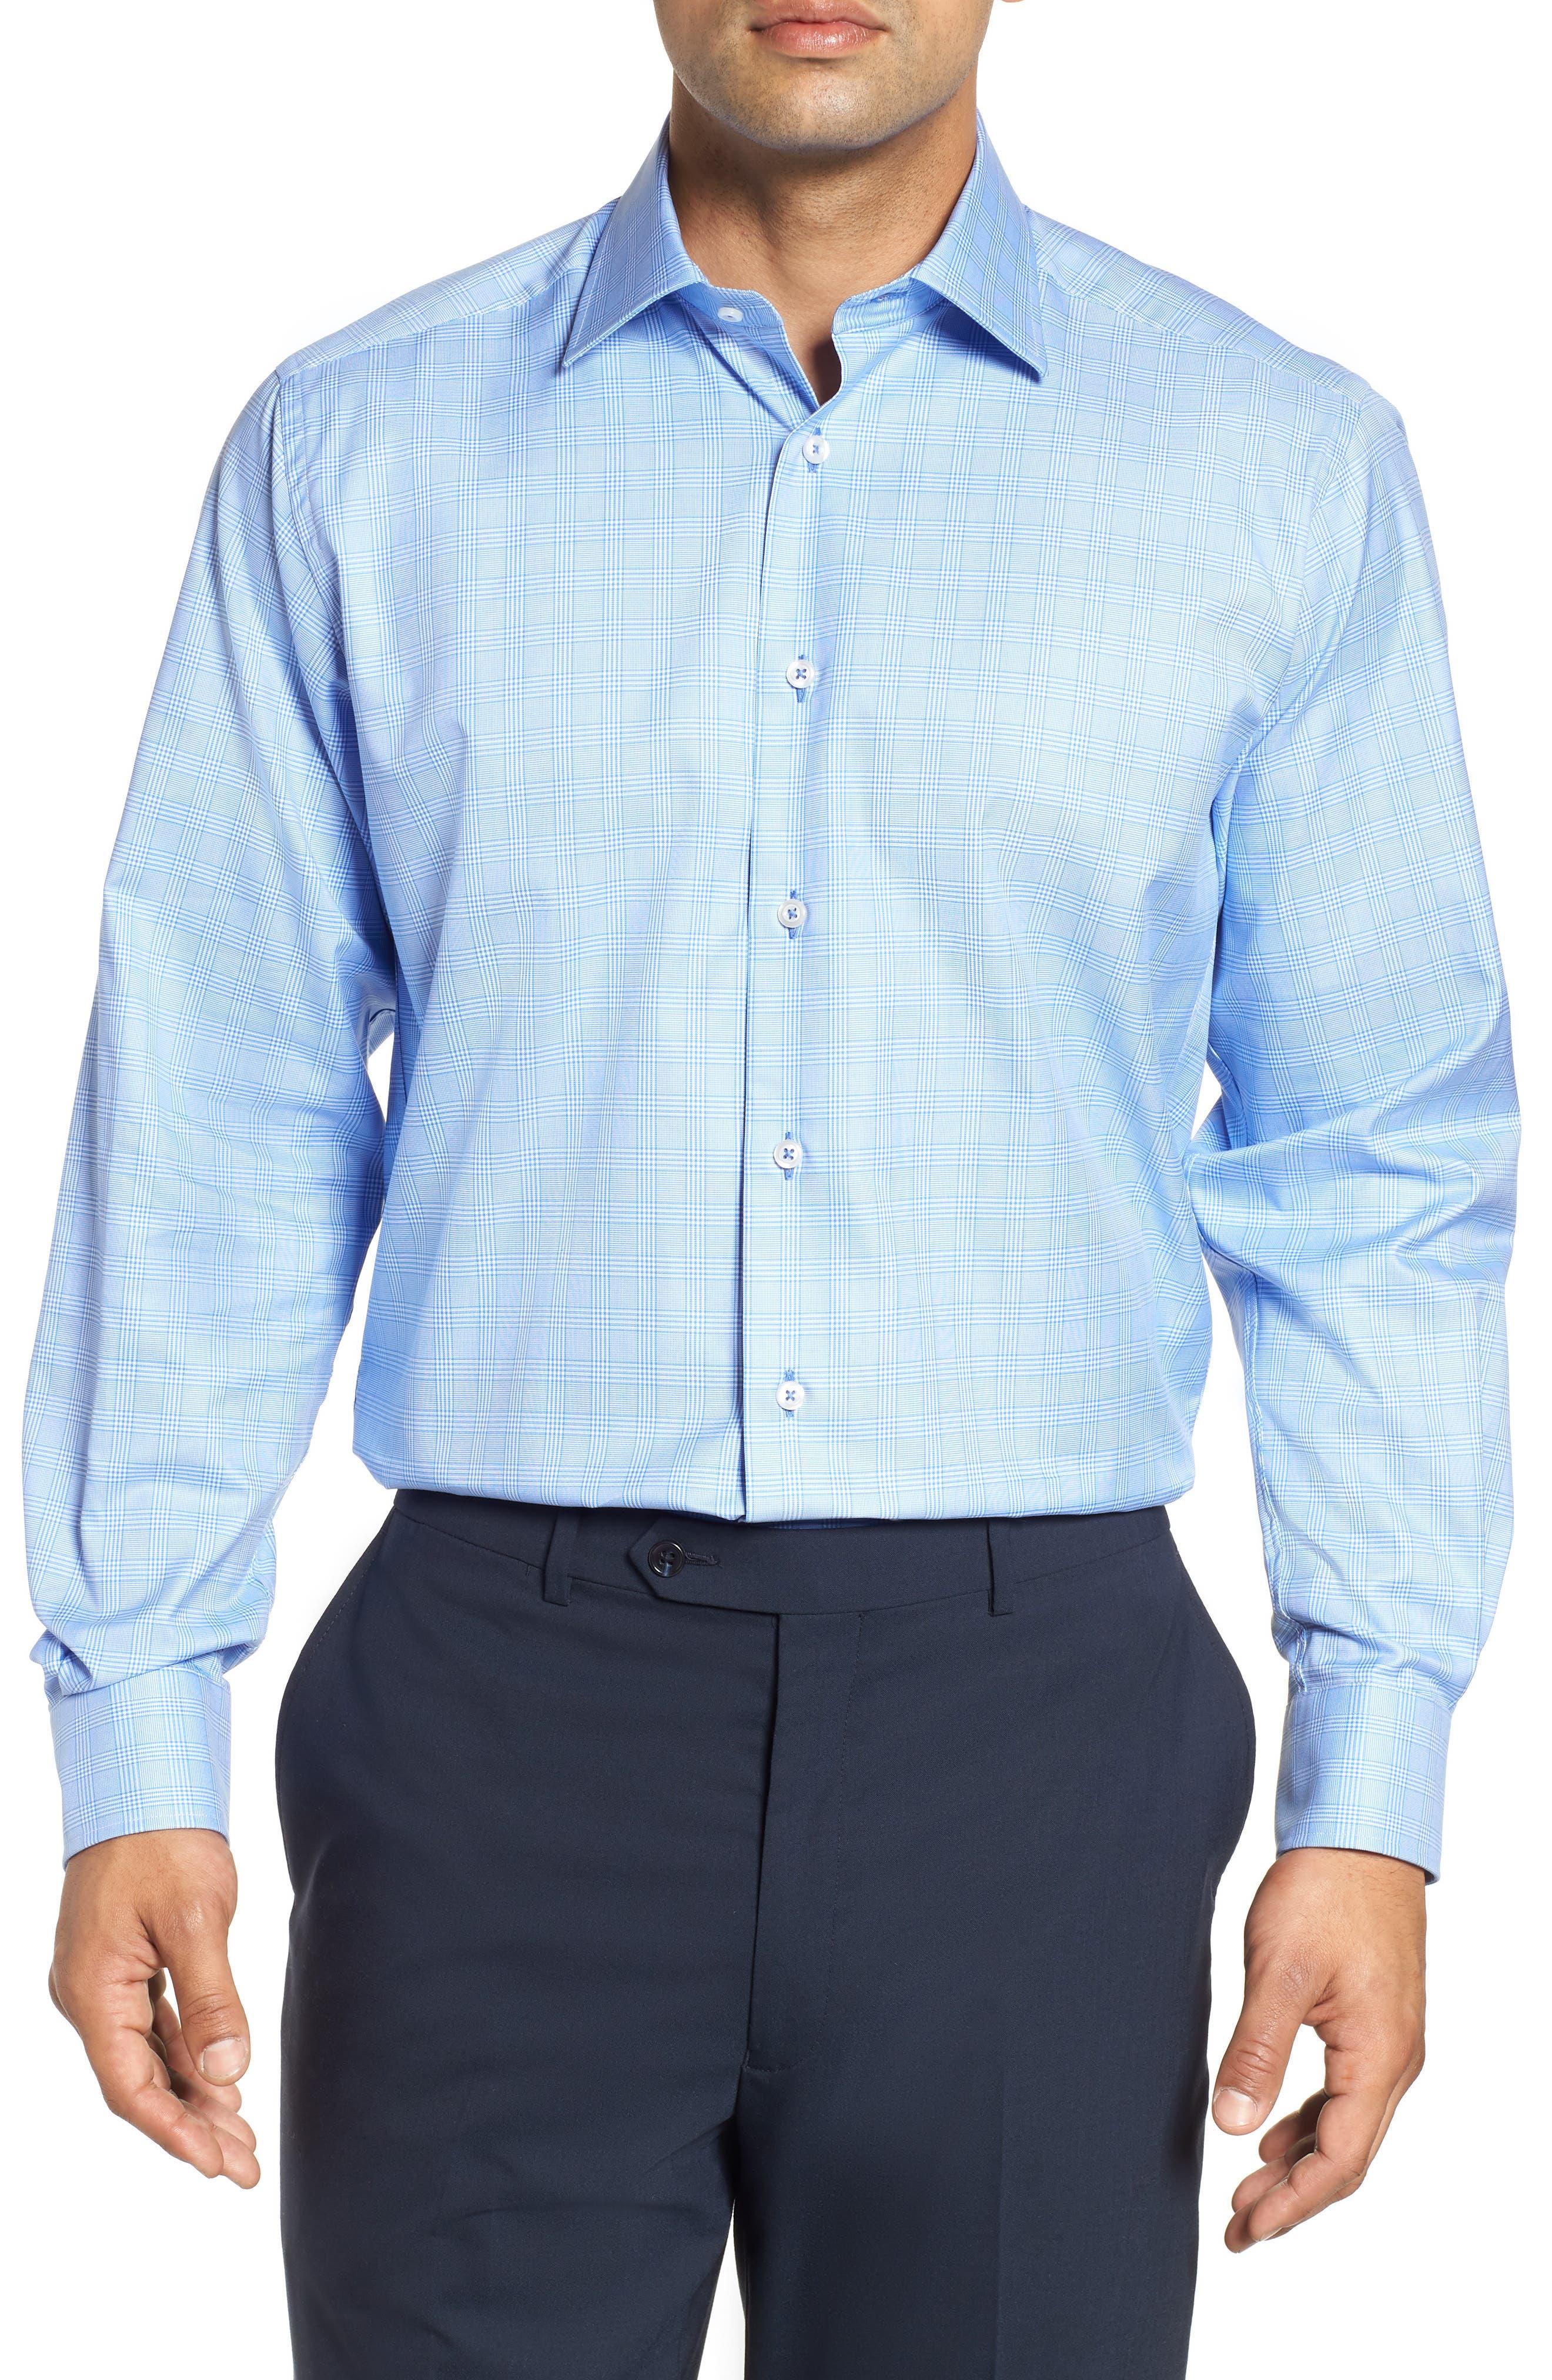 Regular Fit Plaid Dress Shirt,                             Main thumbnail 1, color,                             BLUE